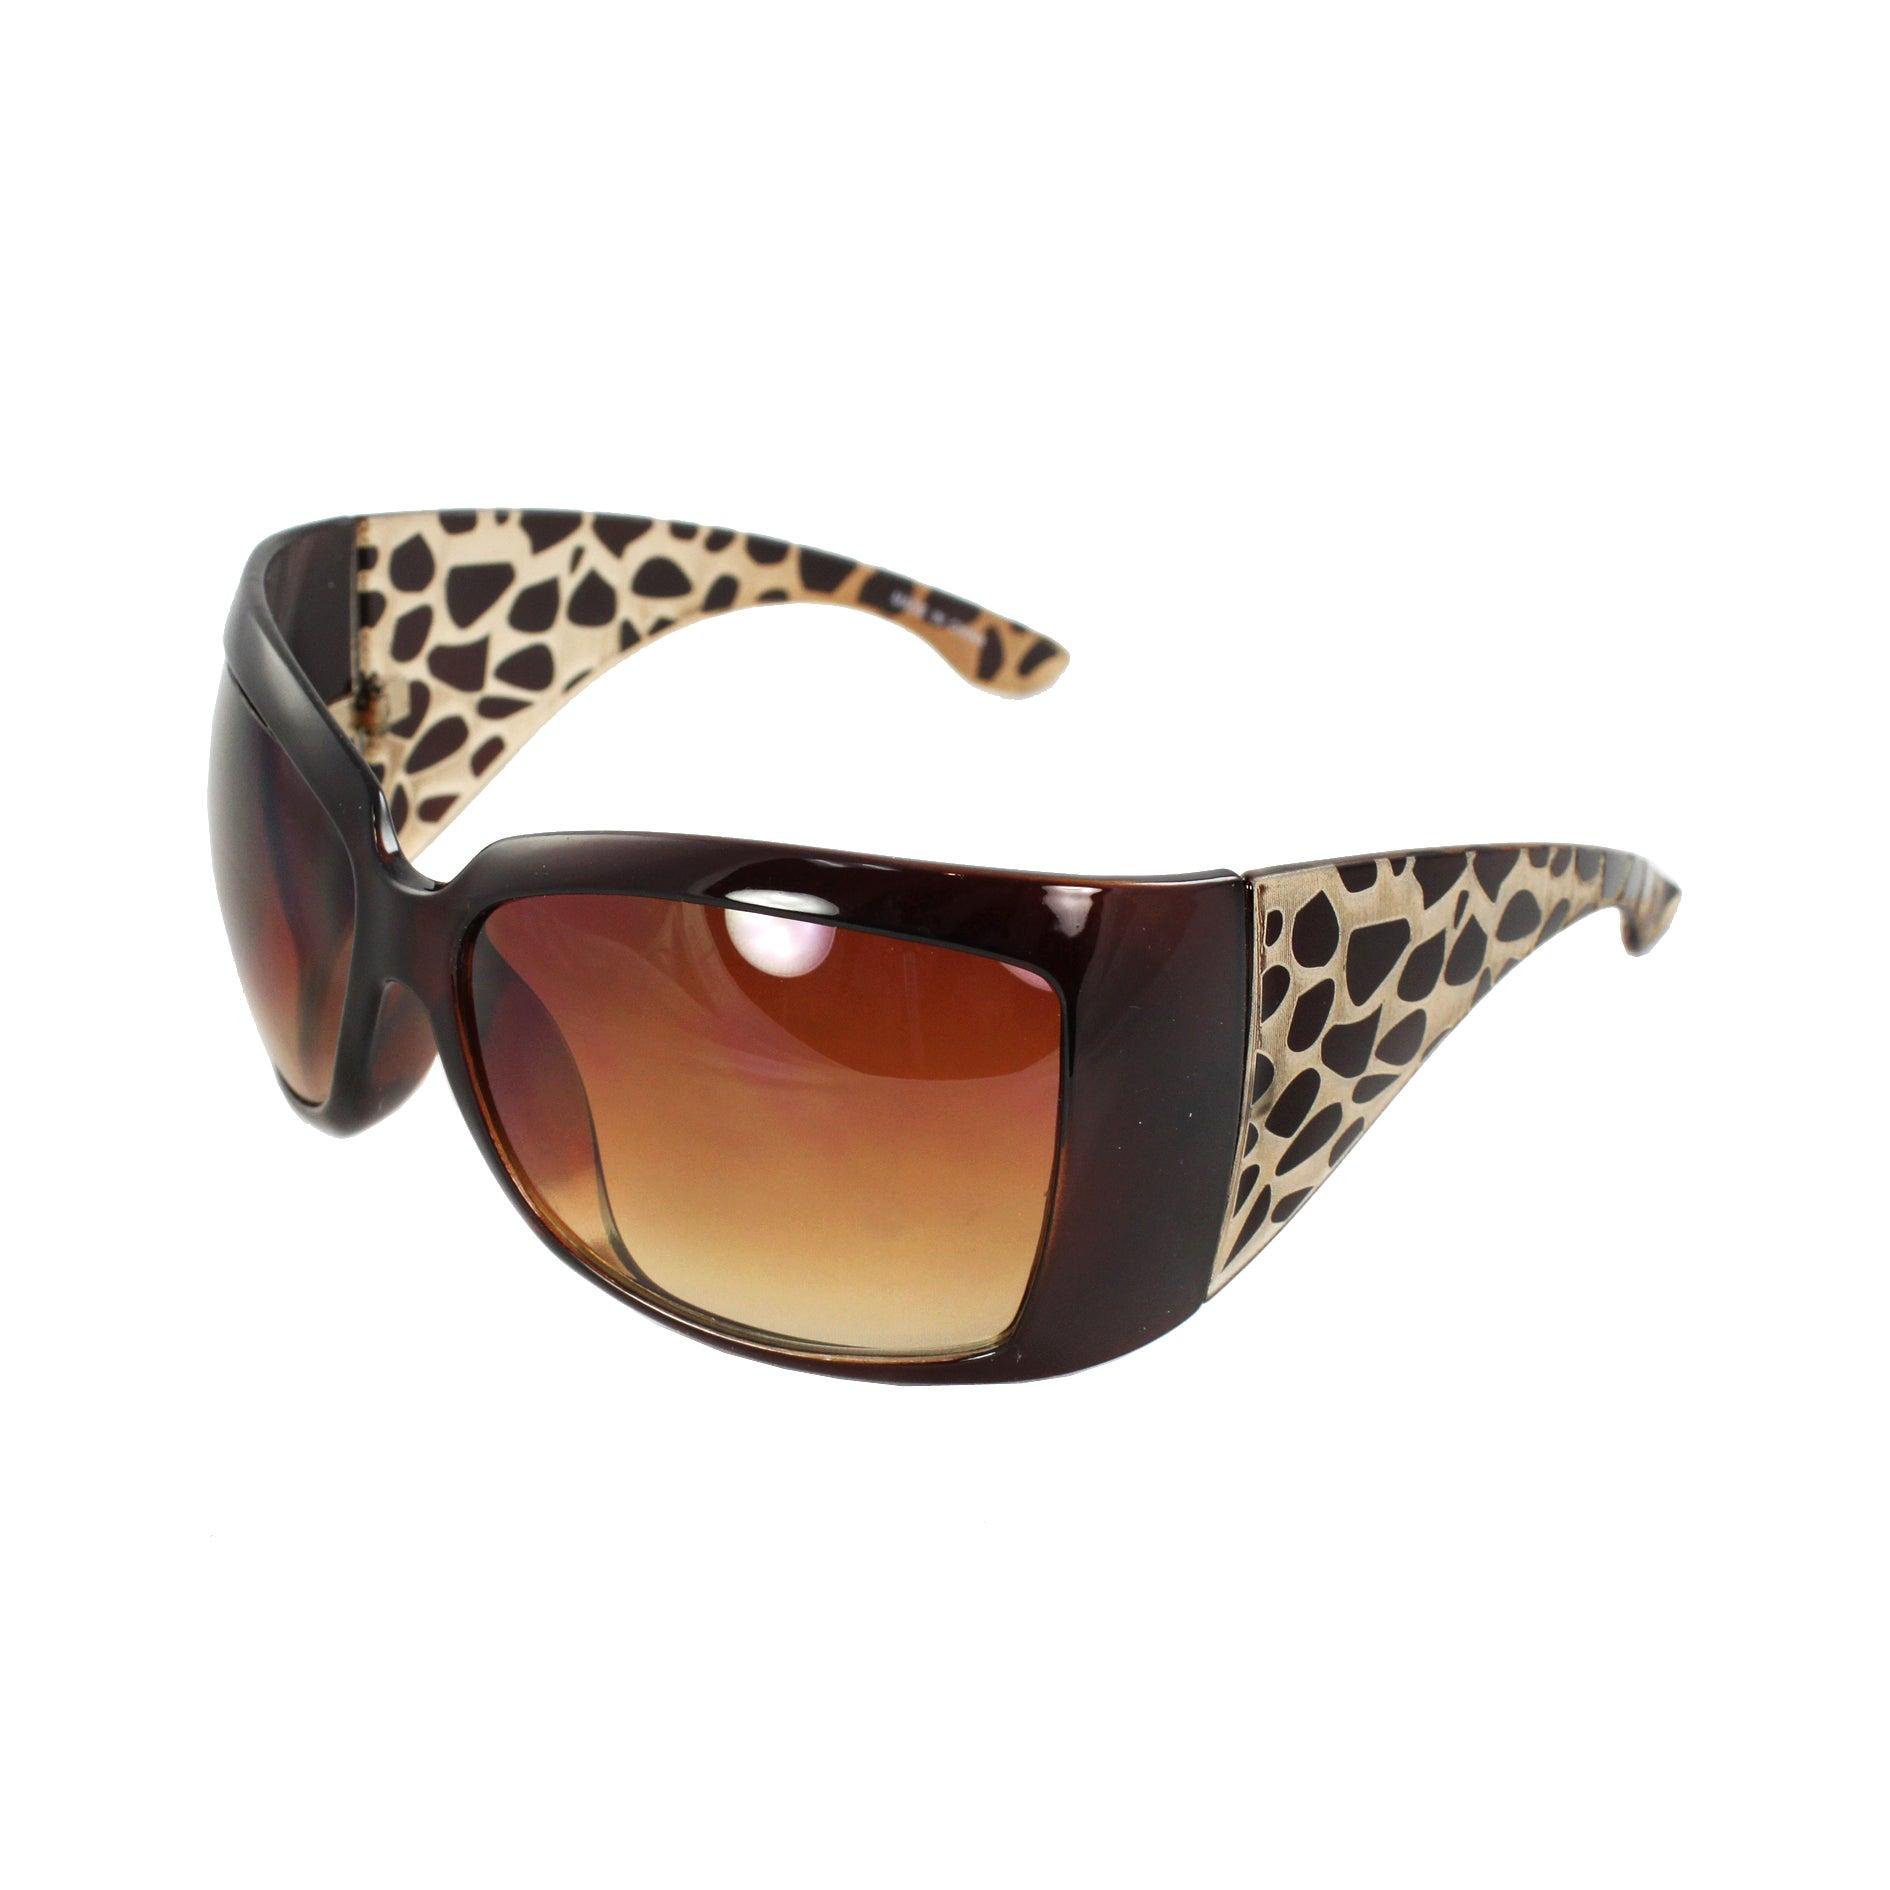 Stylish Wrap Sunglasses Brown Frame Amber Gradient Lenses for Women and Men